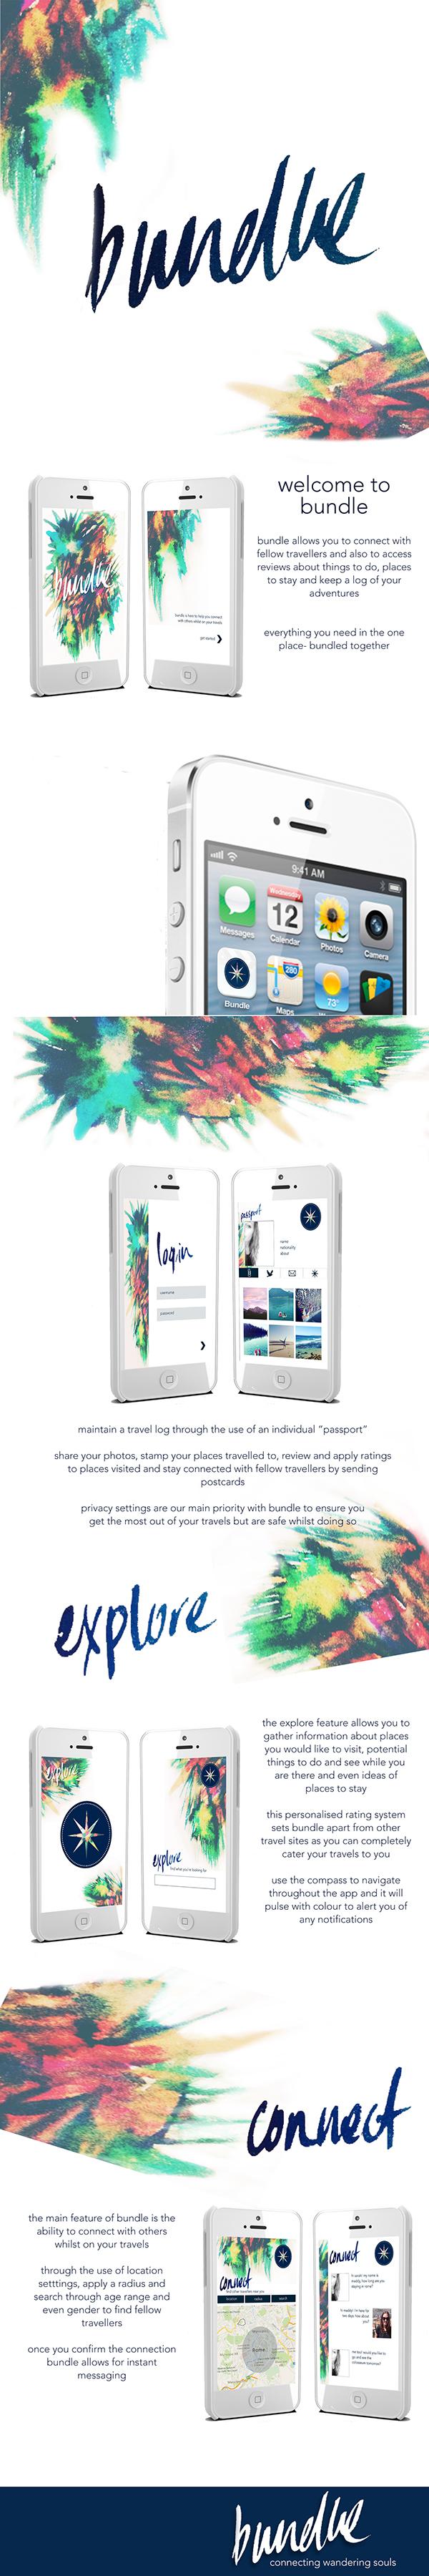 watercolour graphicdesign Appdesign Handlettering identity Interface design Travel UI app ios phone